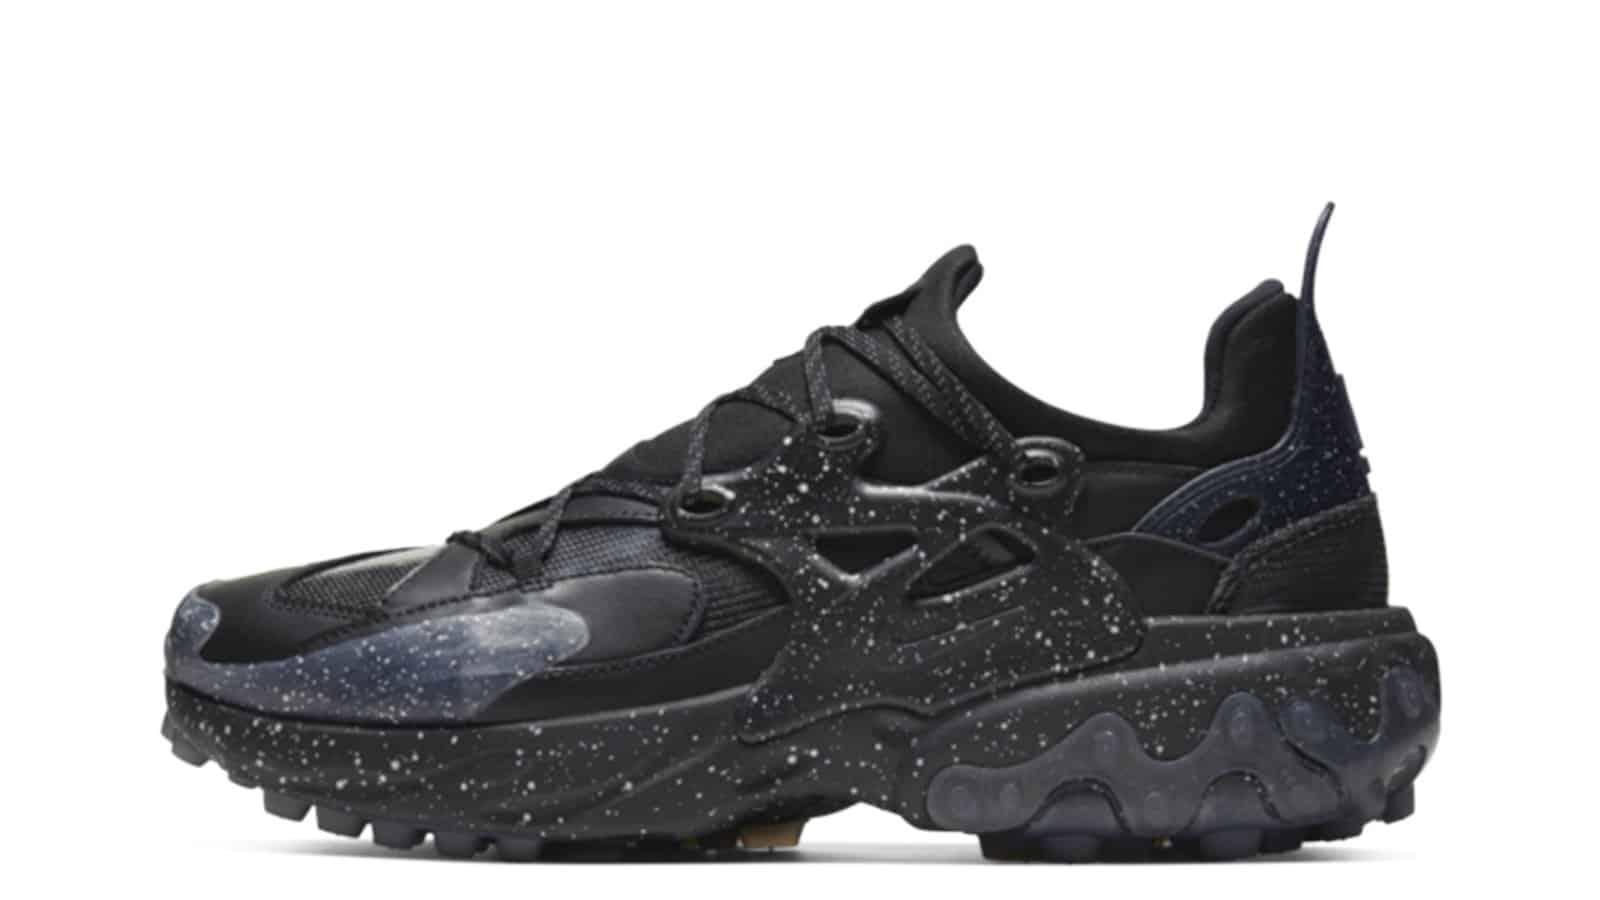 UNDERCOVER x Nike React Presto 'Black'